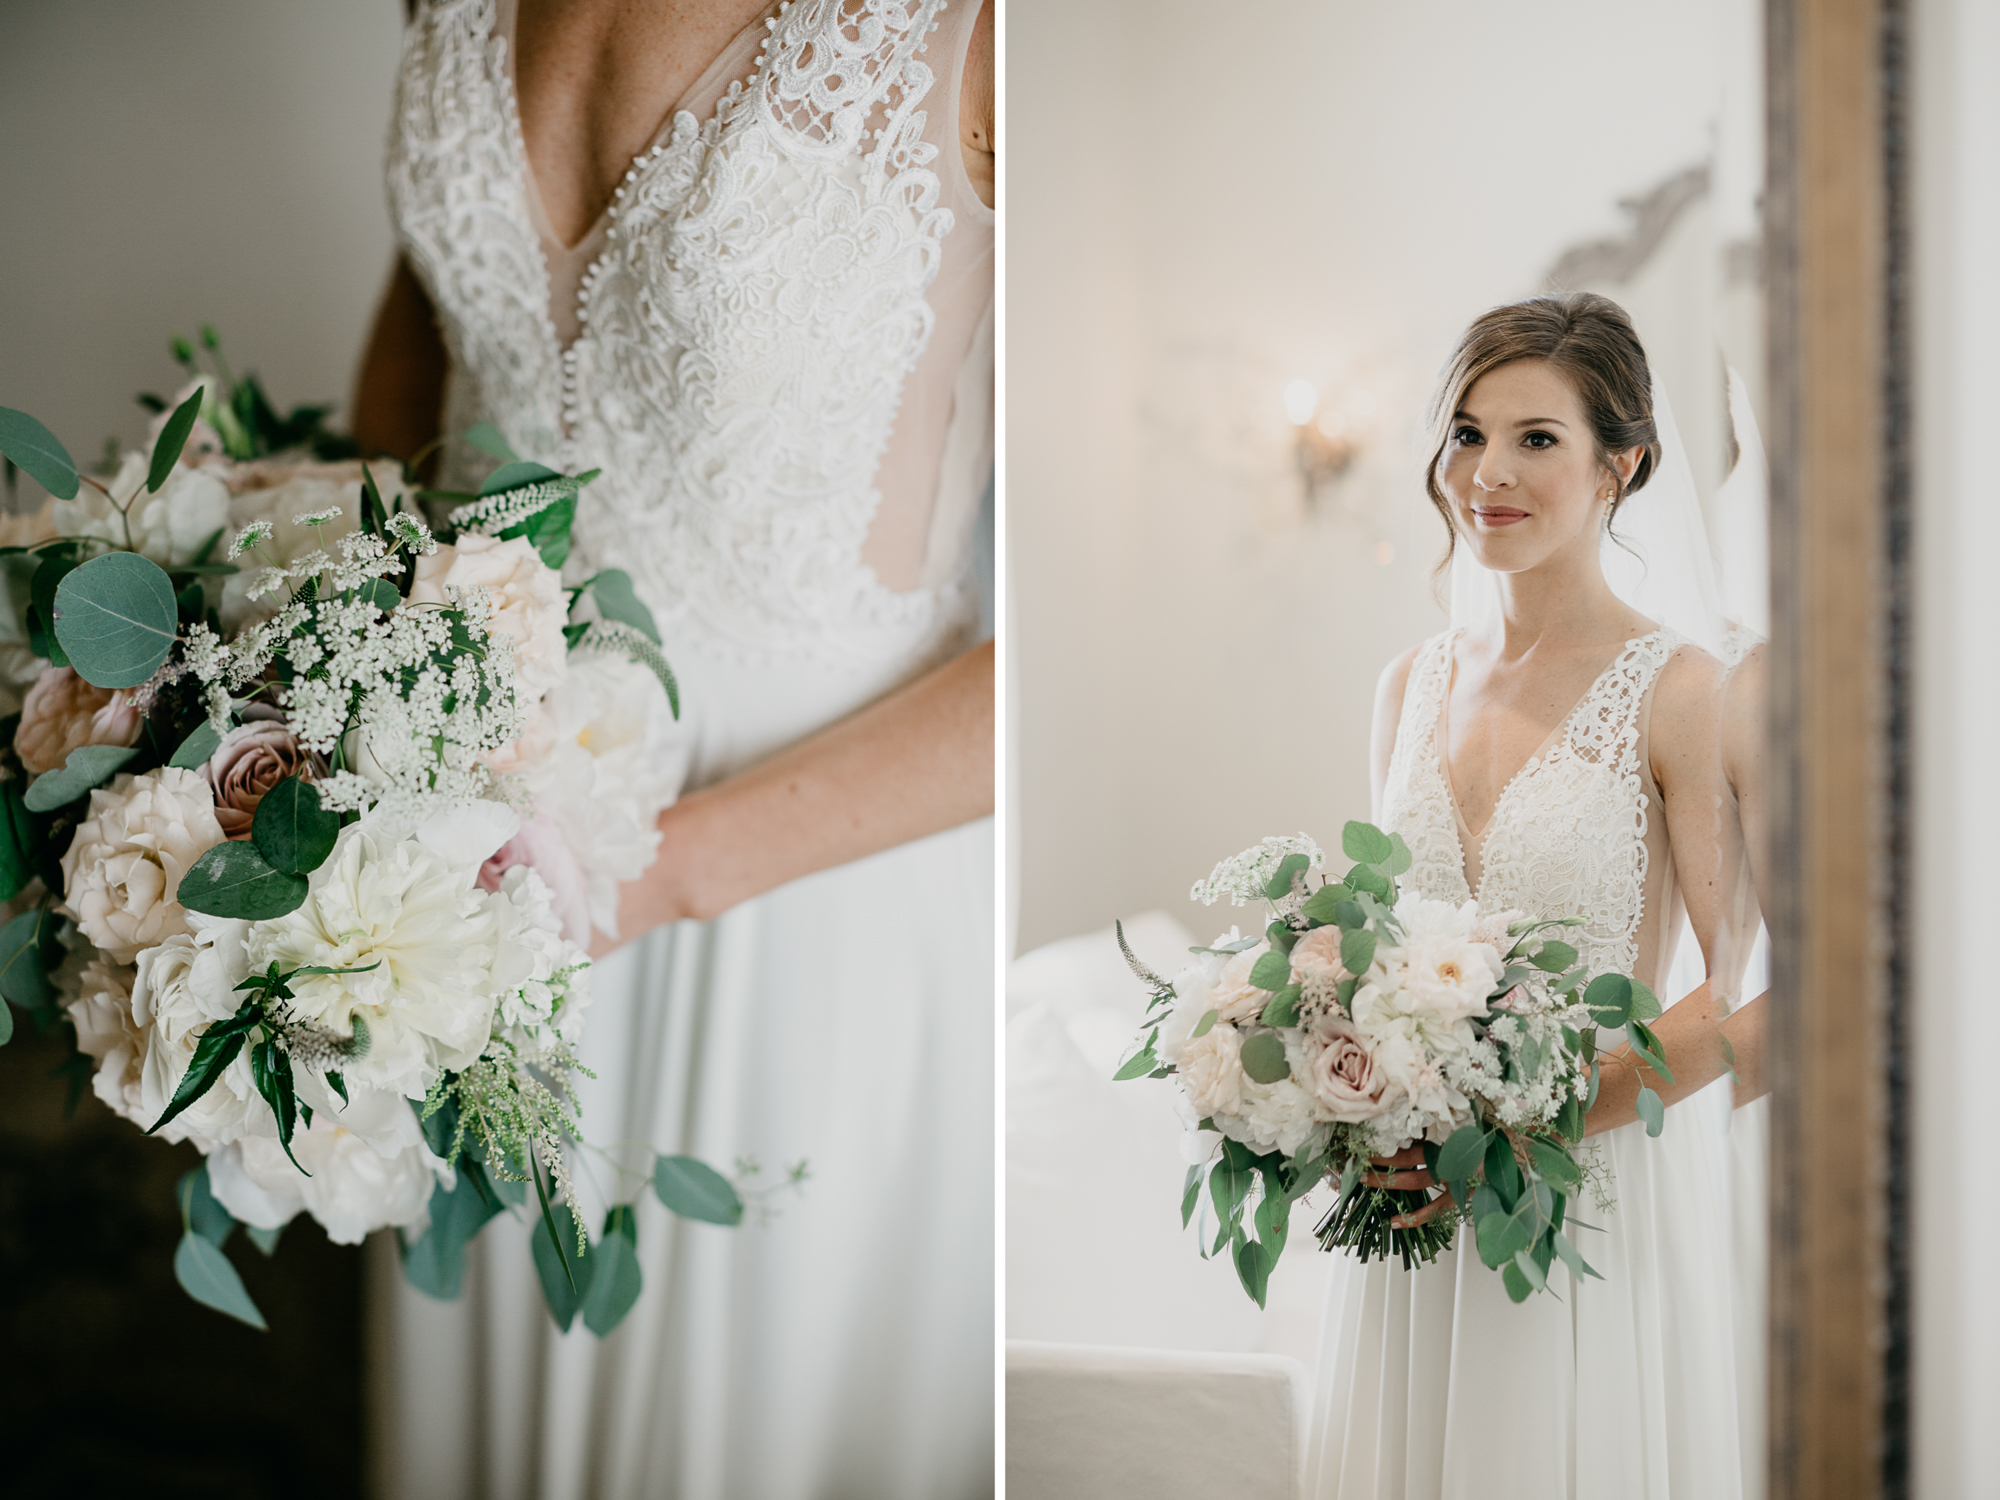 Jaclyn_Andrew_quincy_massachusetts_wedding004.jpg